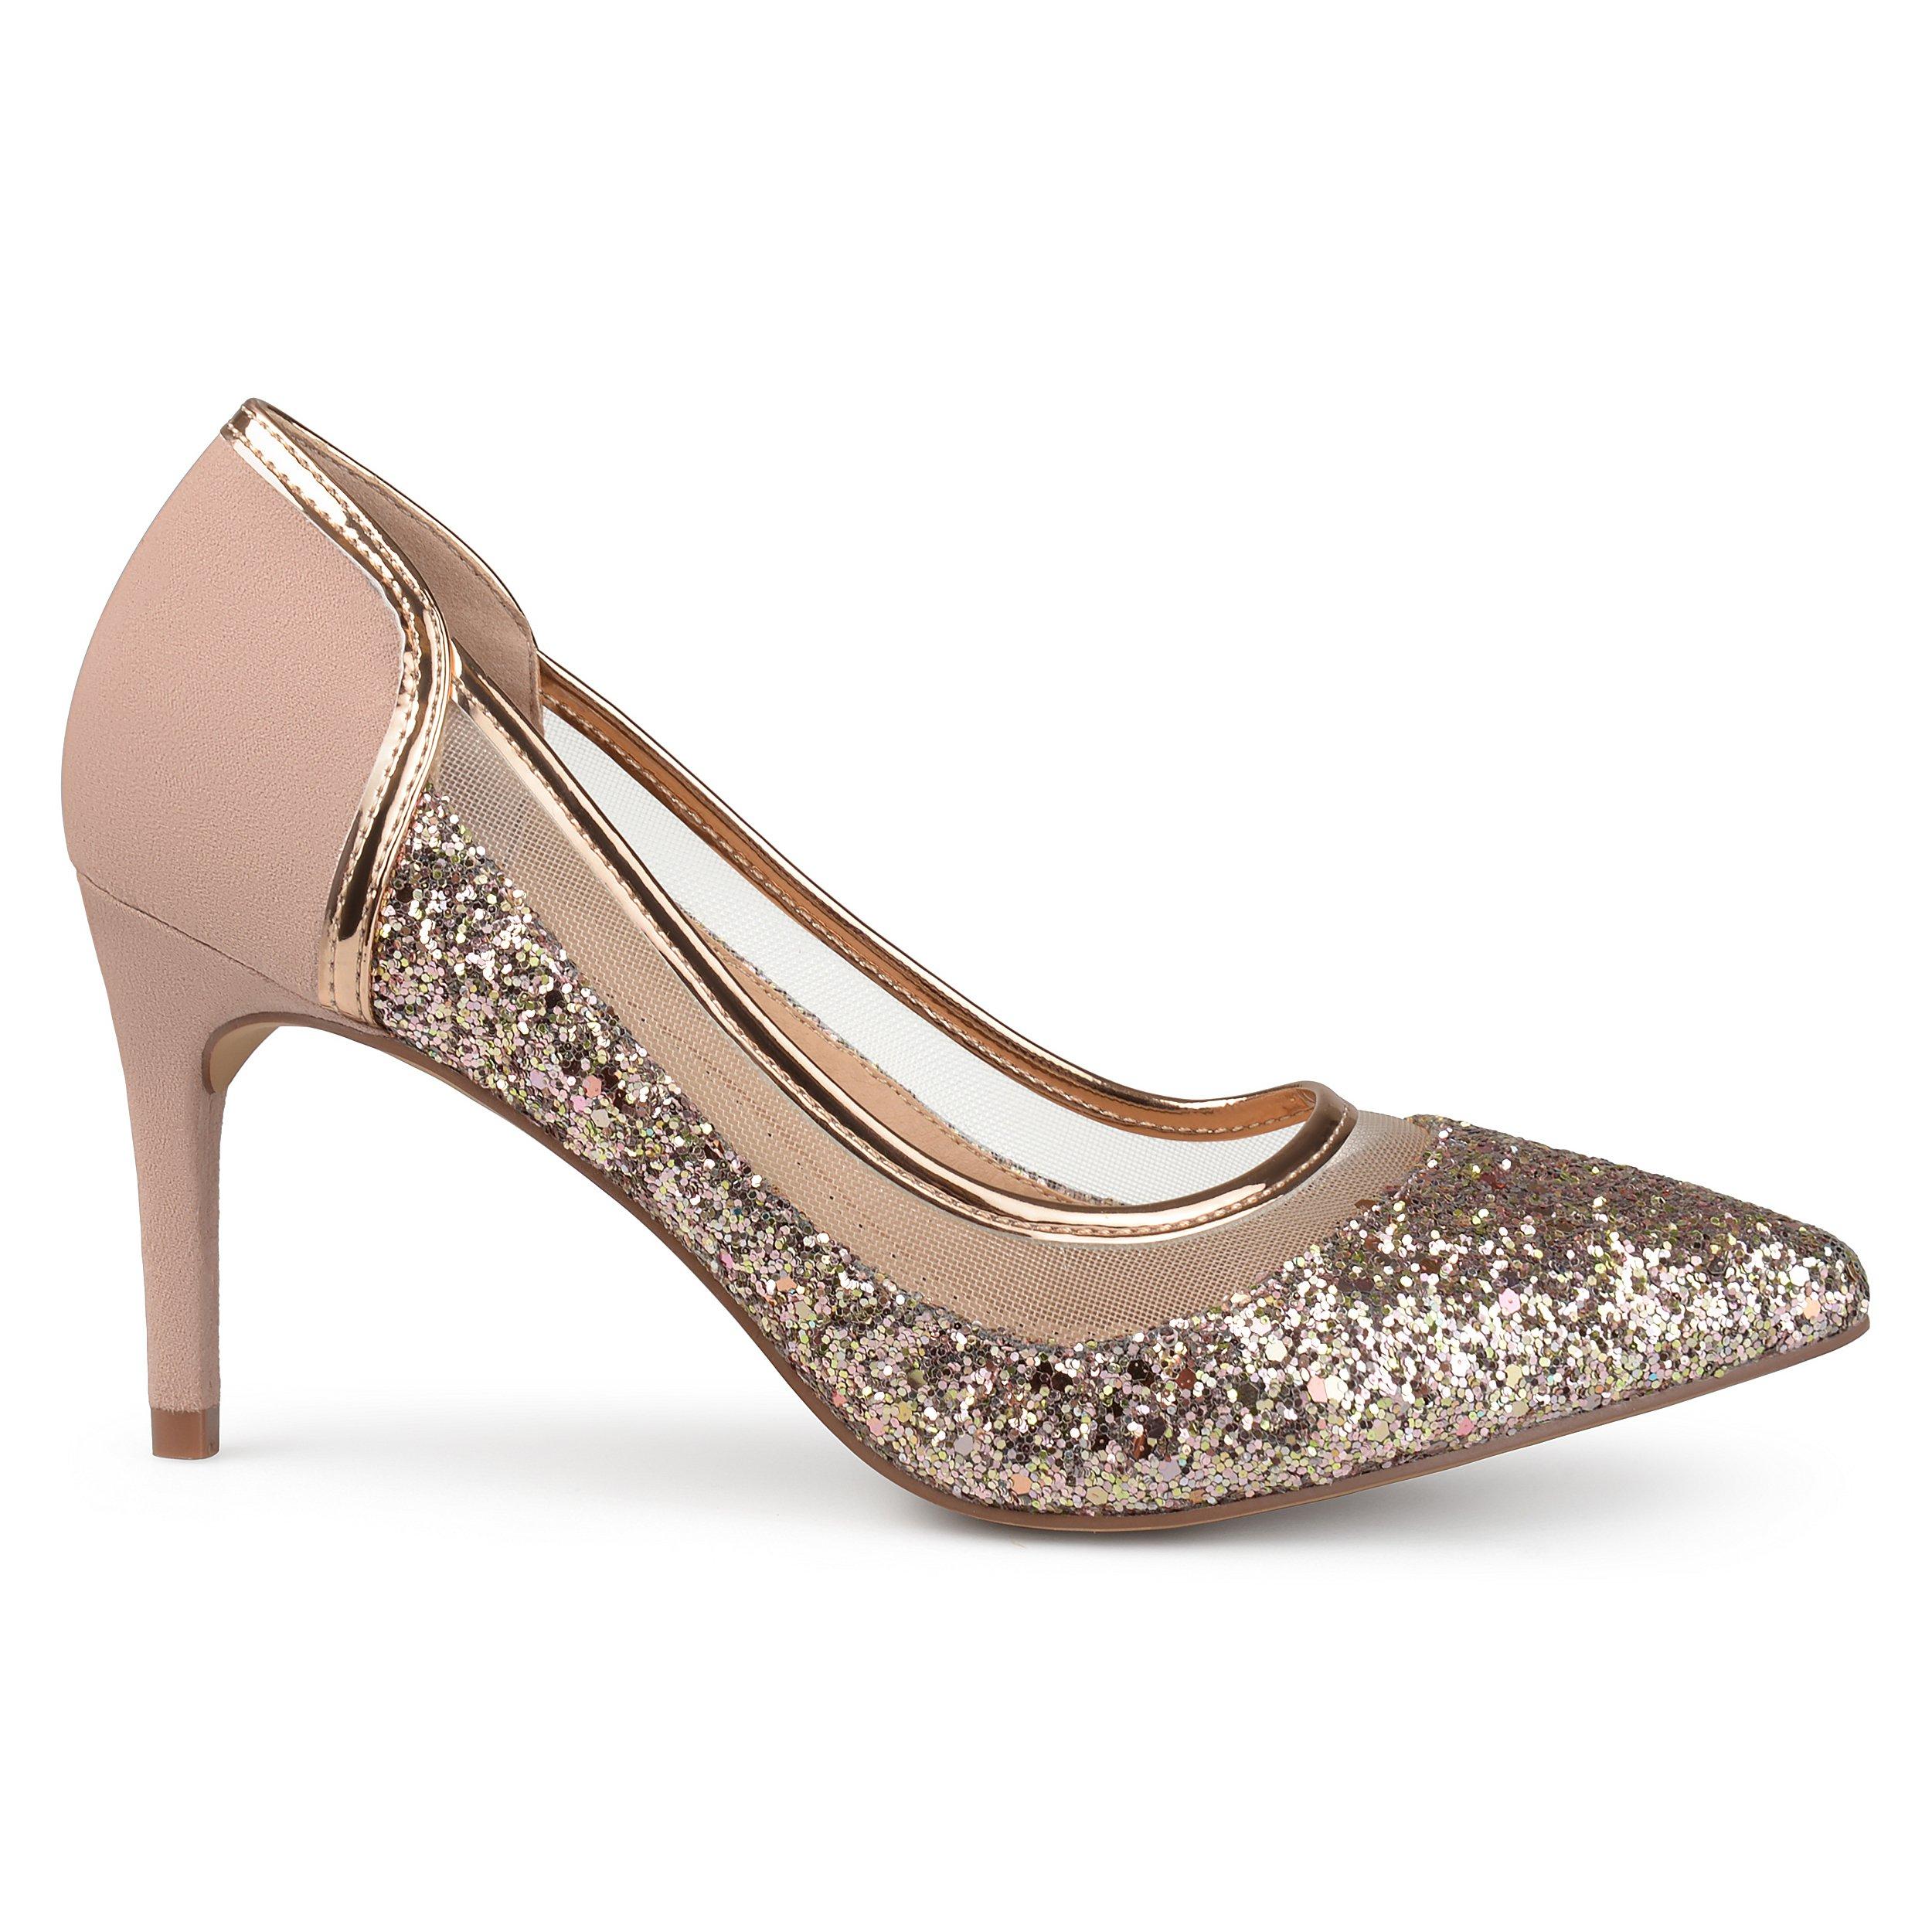 Brinley Co. Womens Kori Faux Suede Mesh Glitter Almond Toe Heels Rose Gold, 7 Regular US